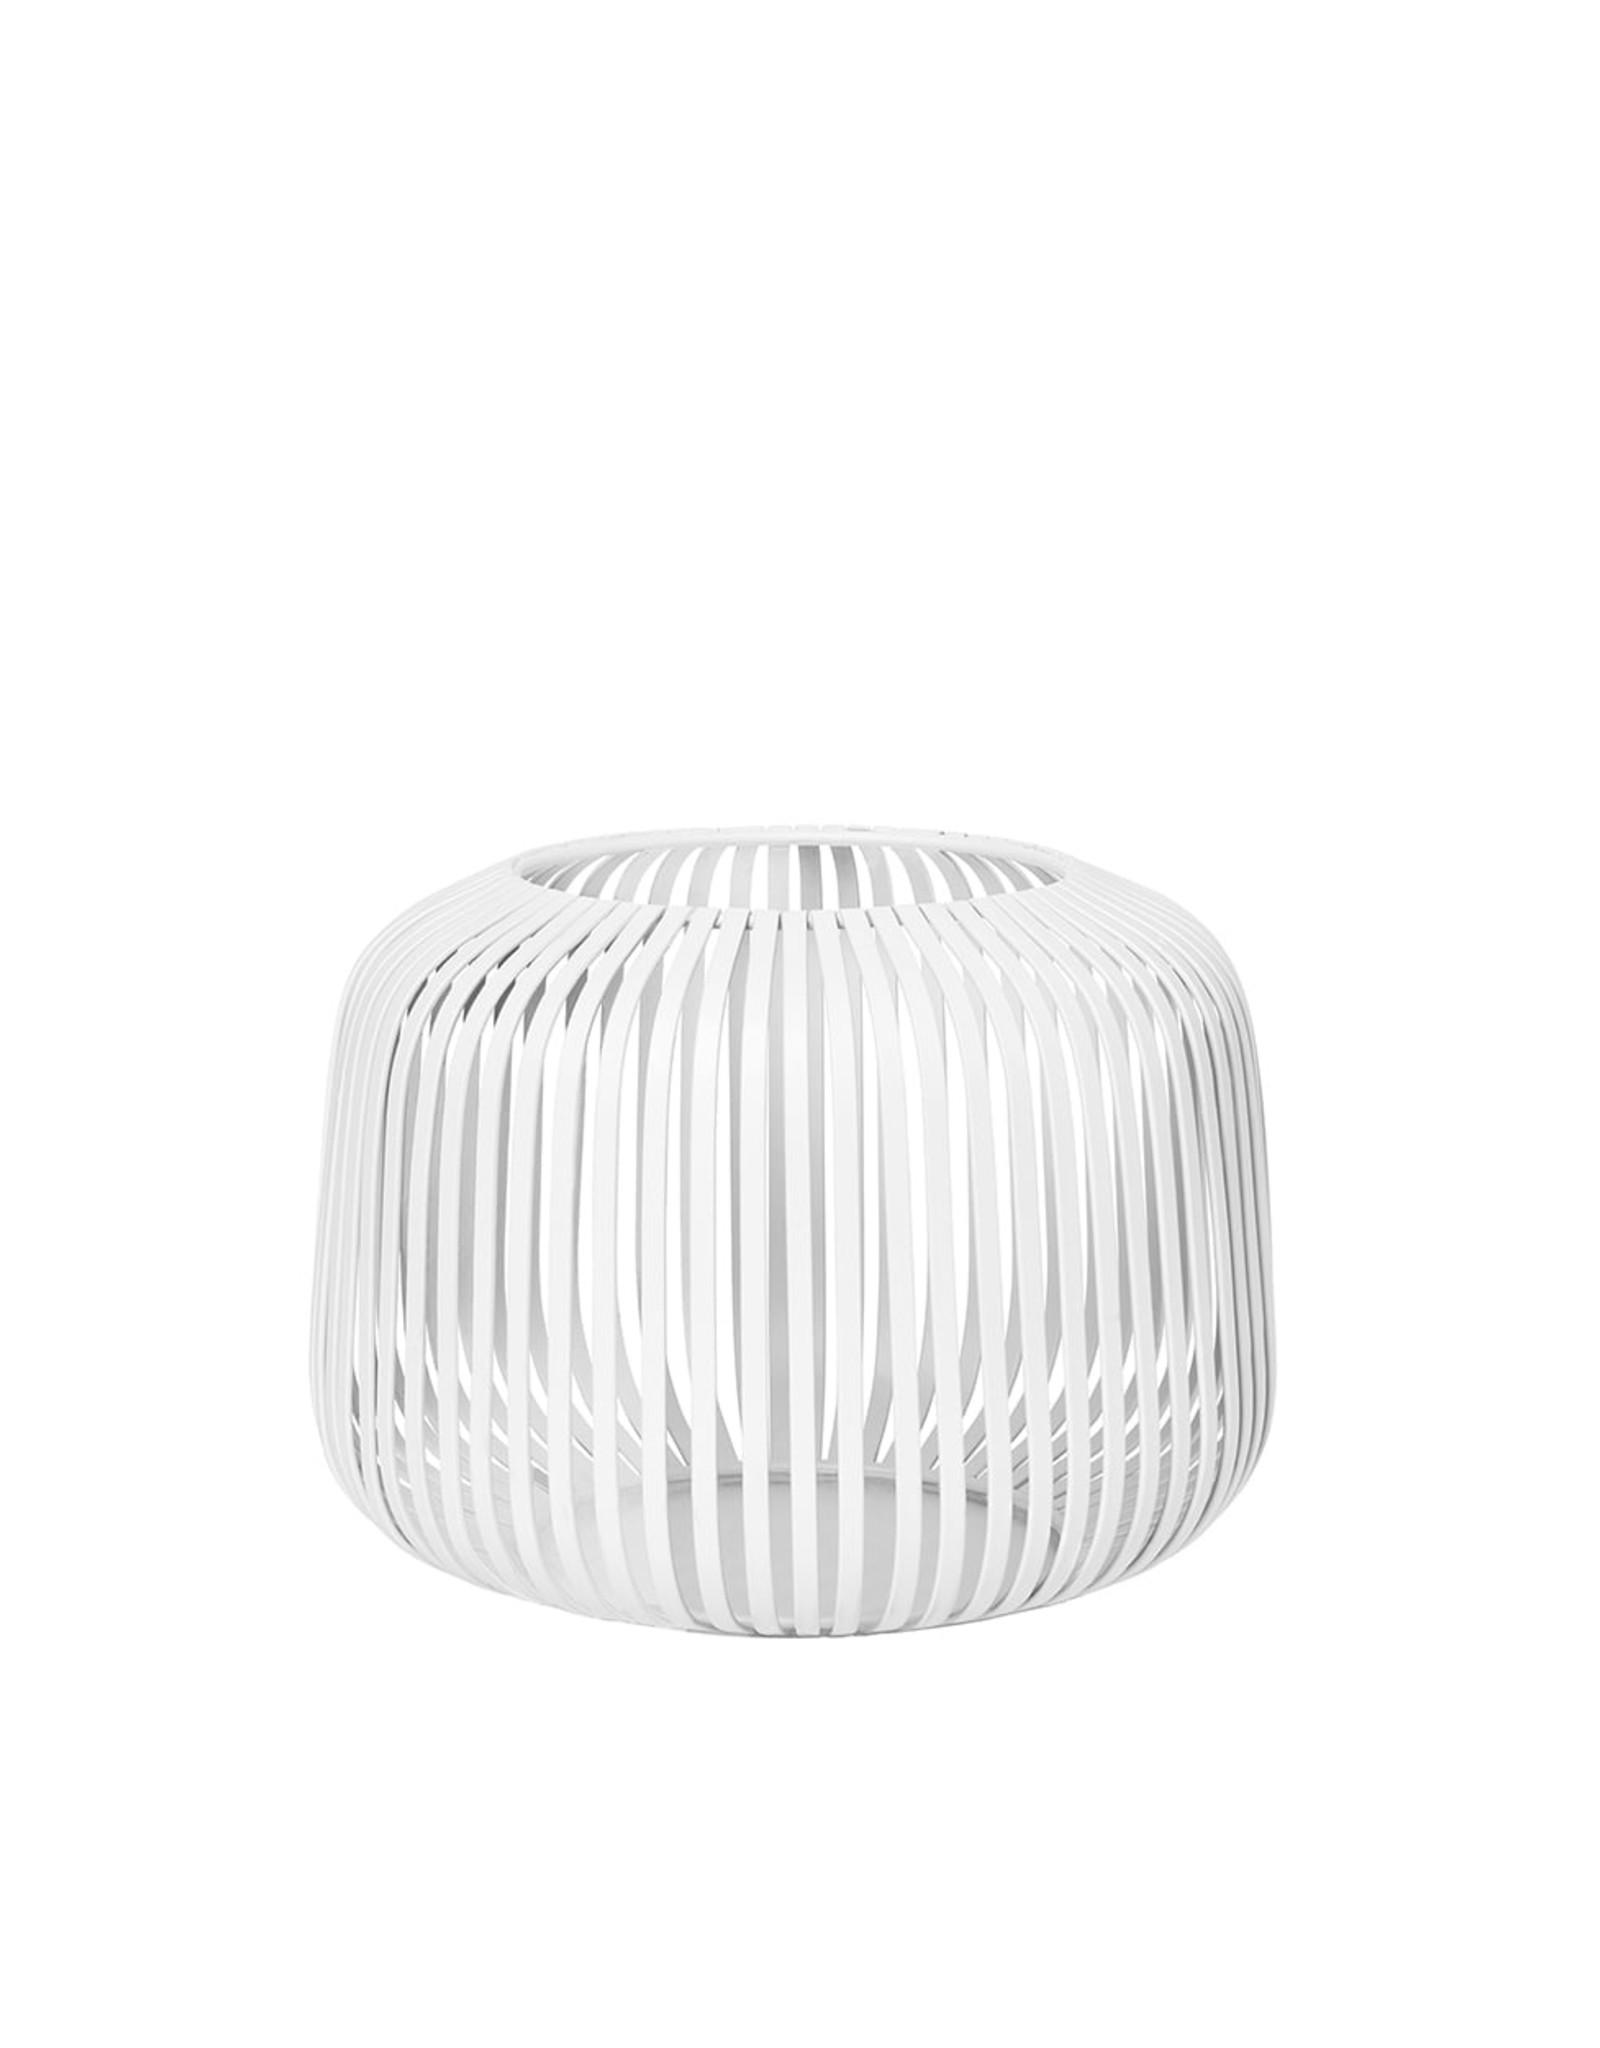 Blomus BLOMUS - LITO windlicht / lantaarn wit staal Ø13,5cm Extra Small